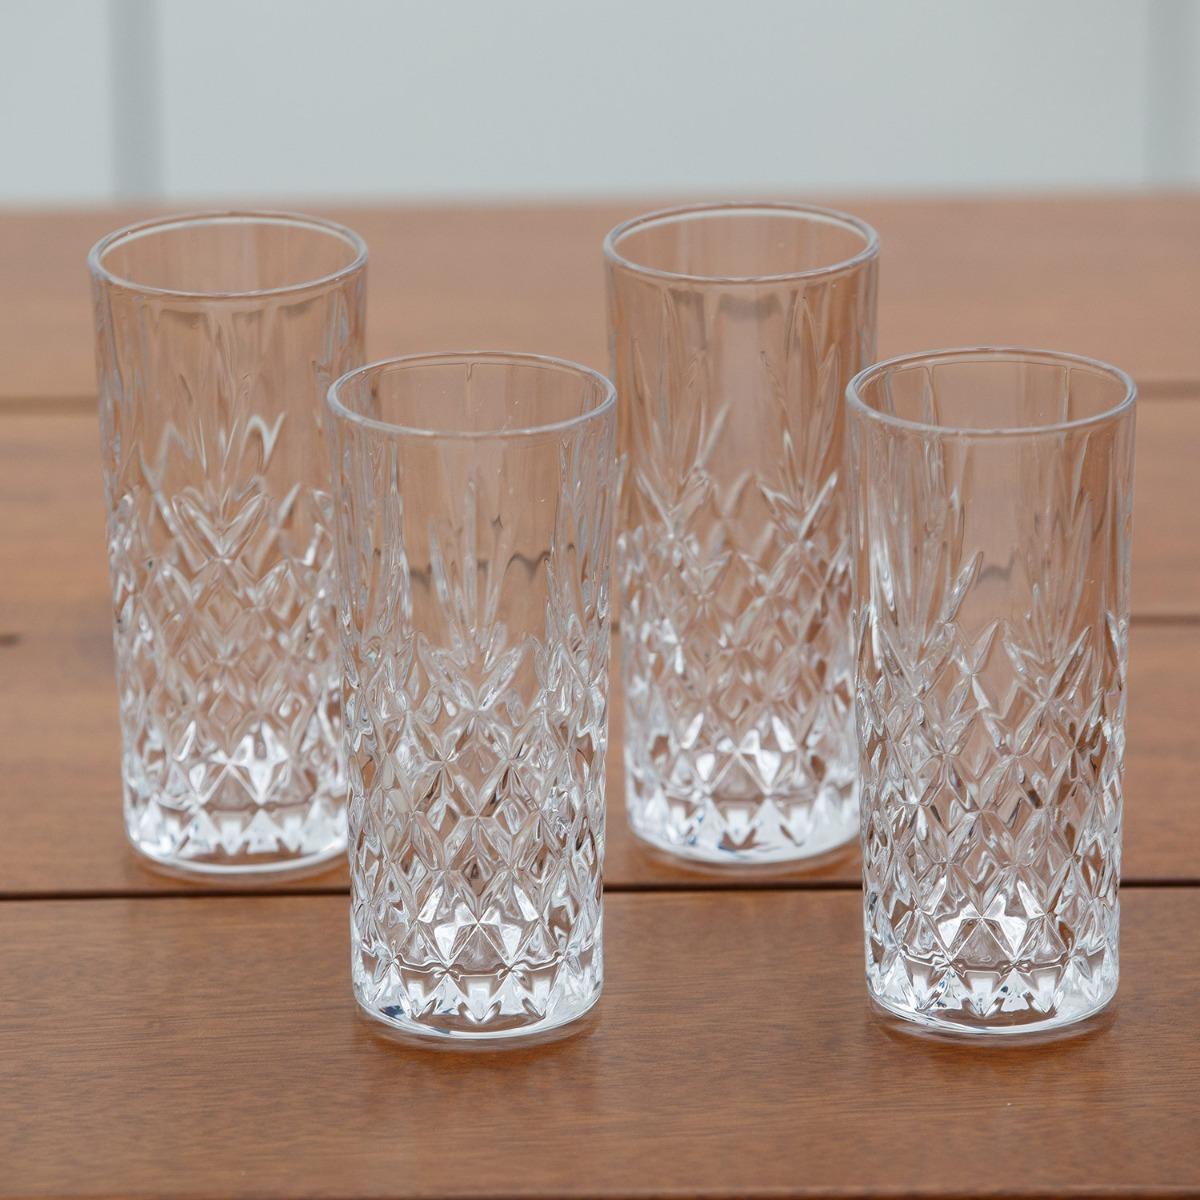 Galway Crystal Highball glasses